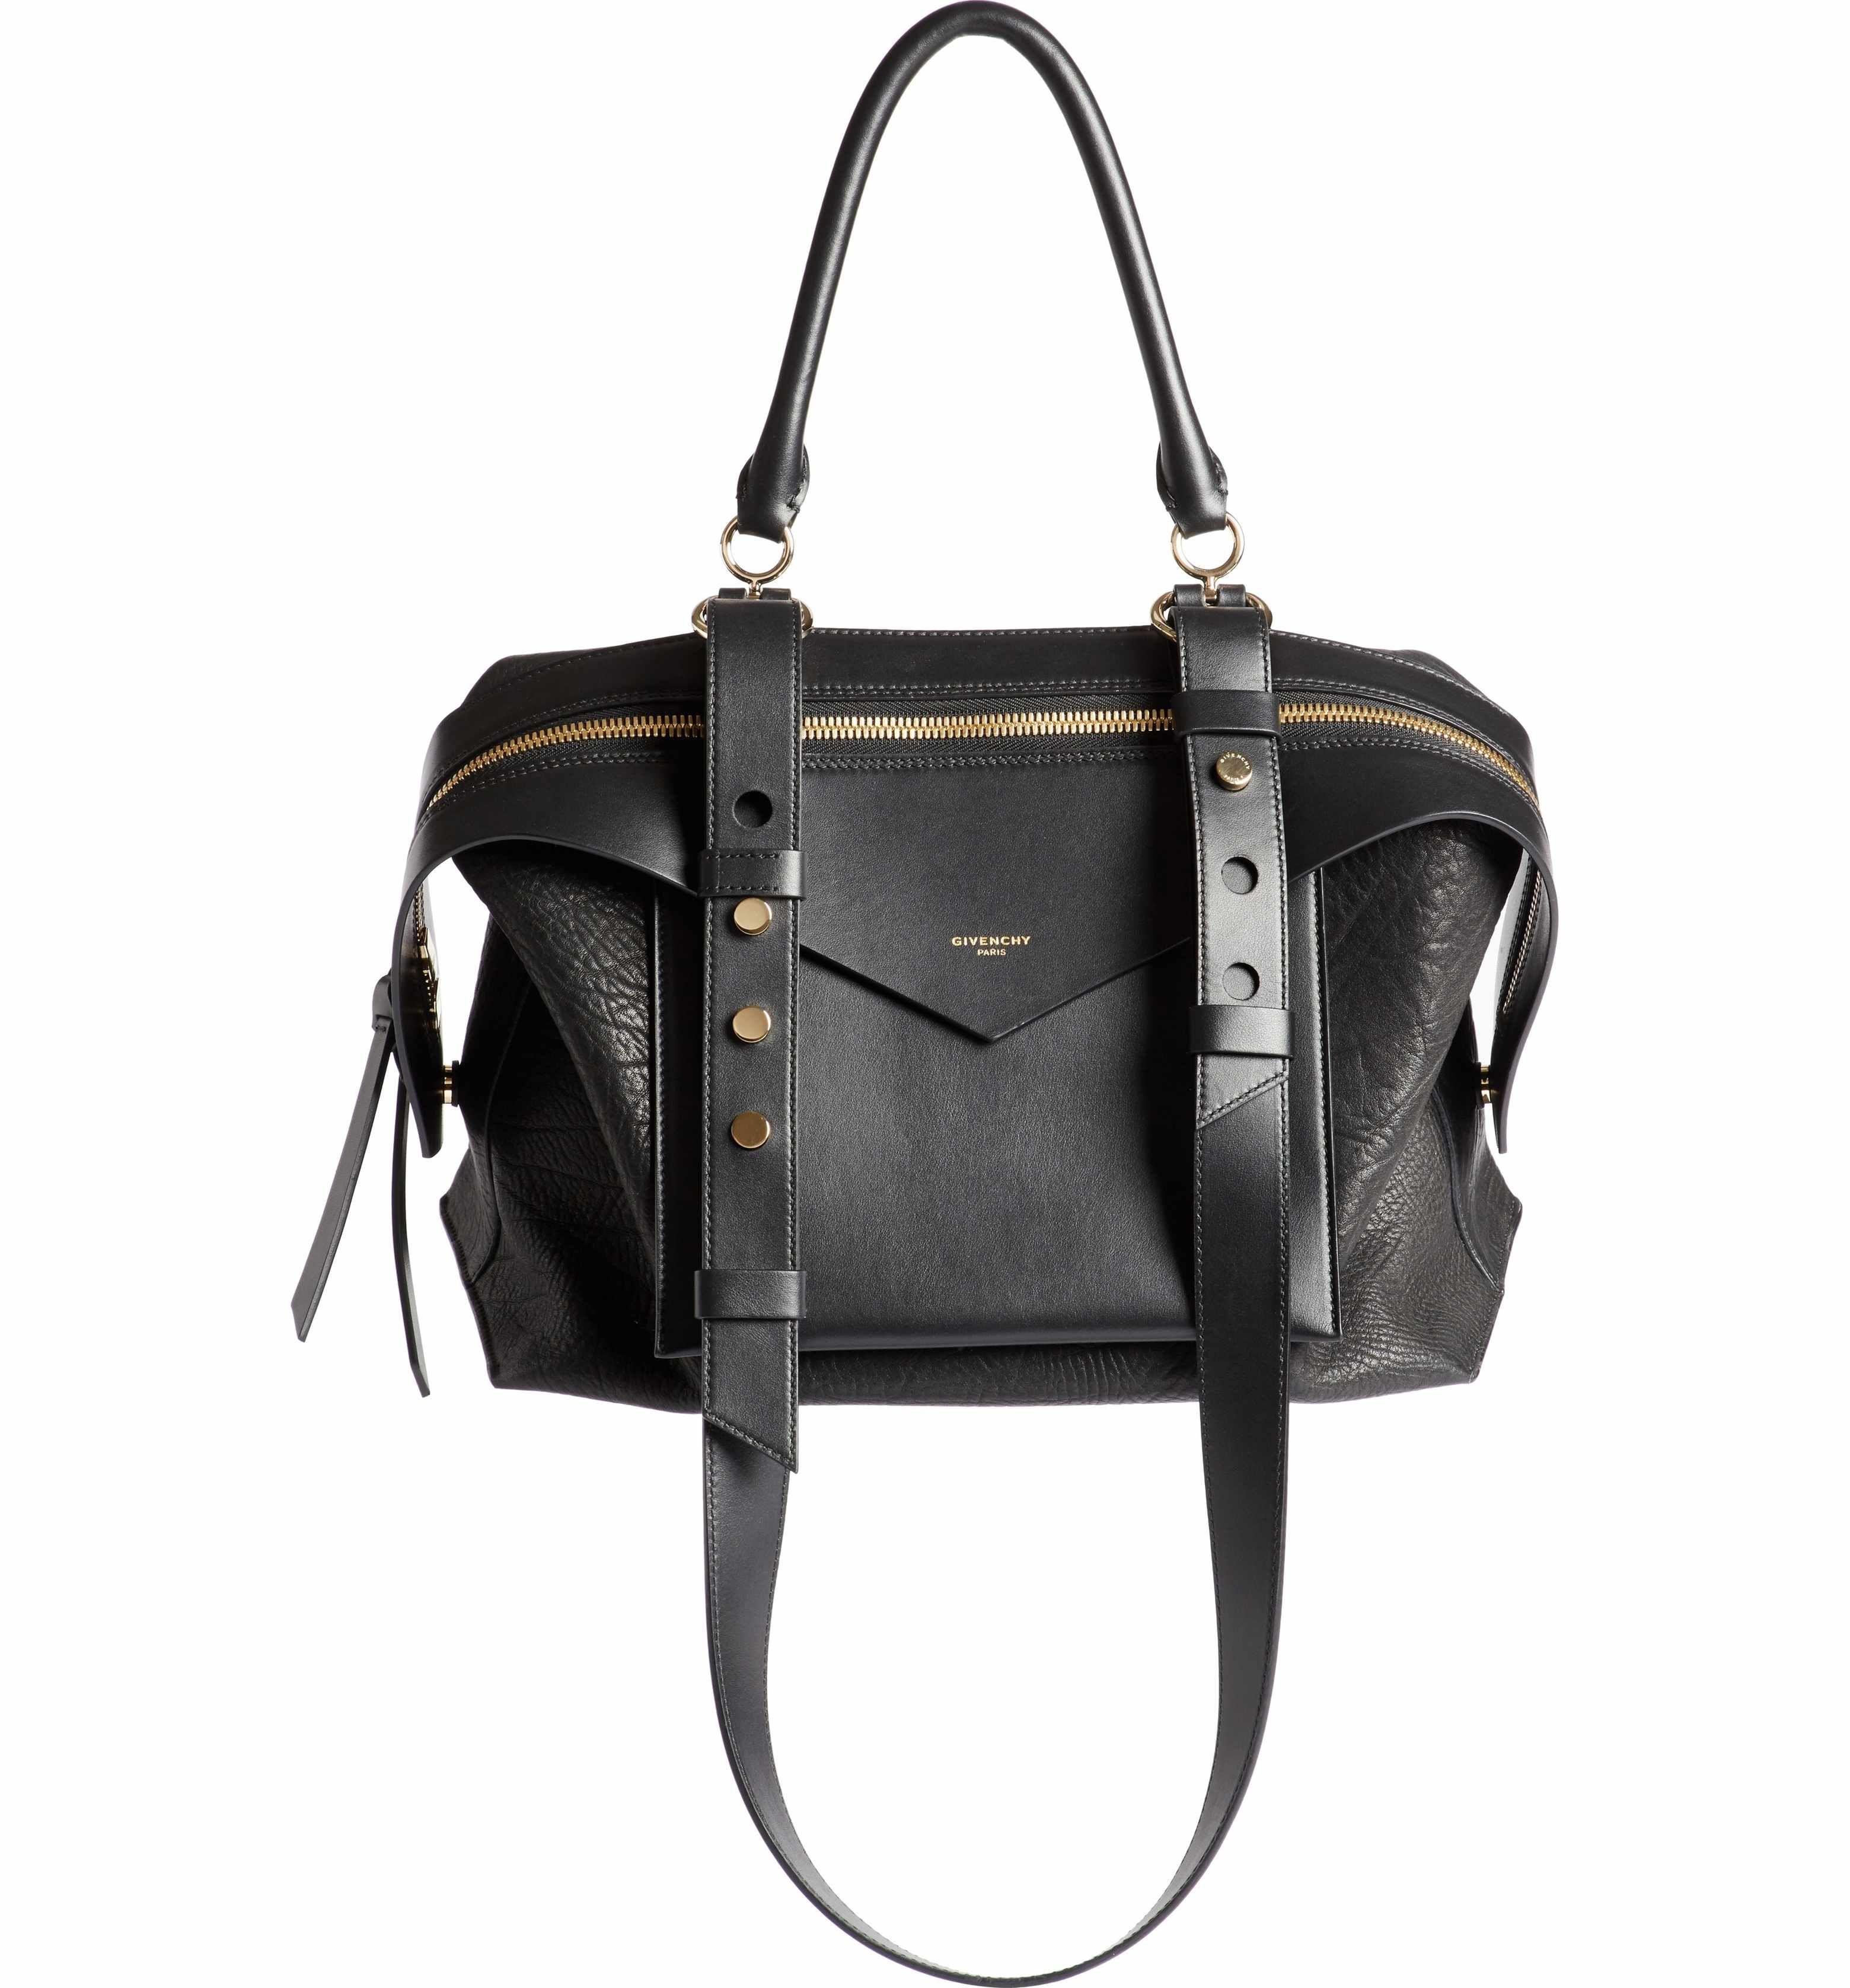 403813ec452 Main Image - Givenchy Medium Sway Leather Satchel   Bag Swag ...